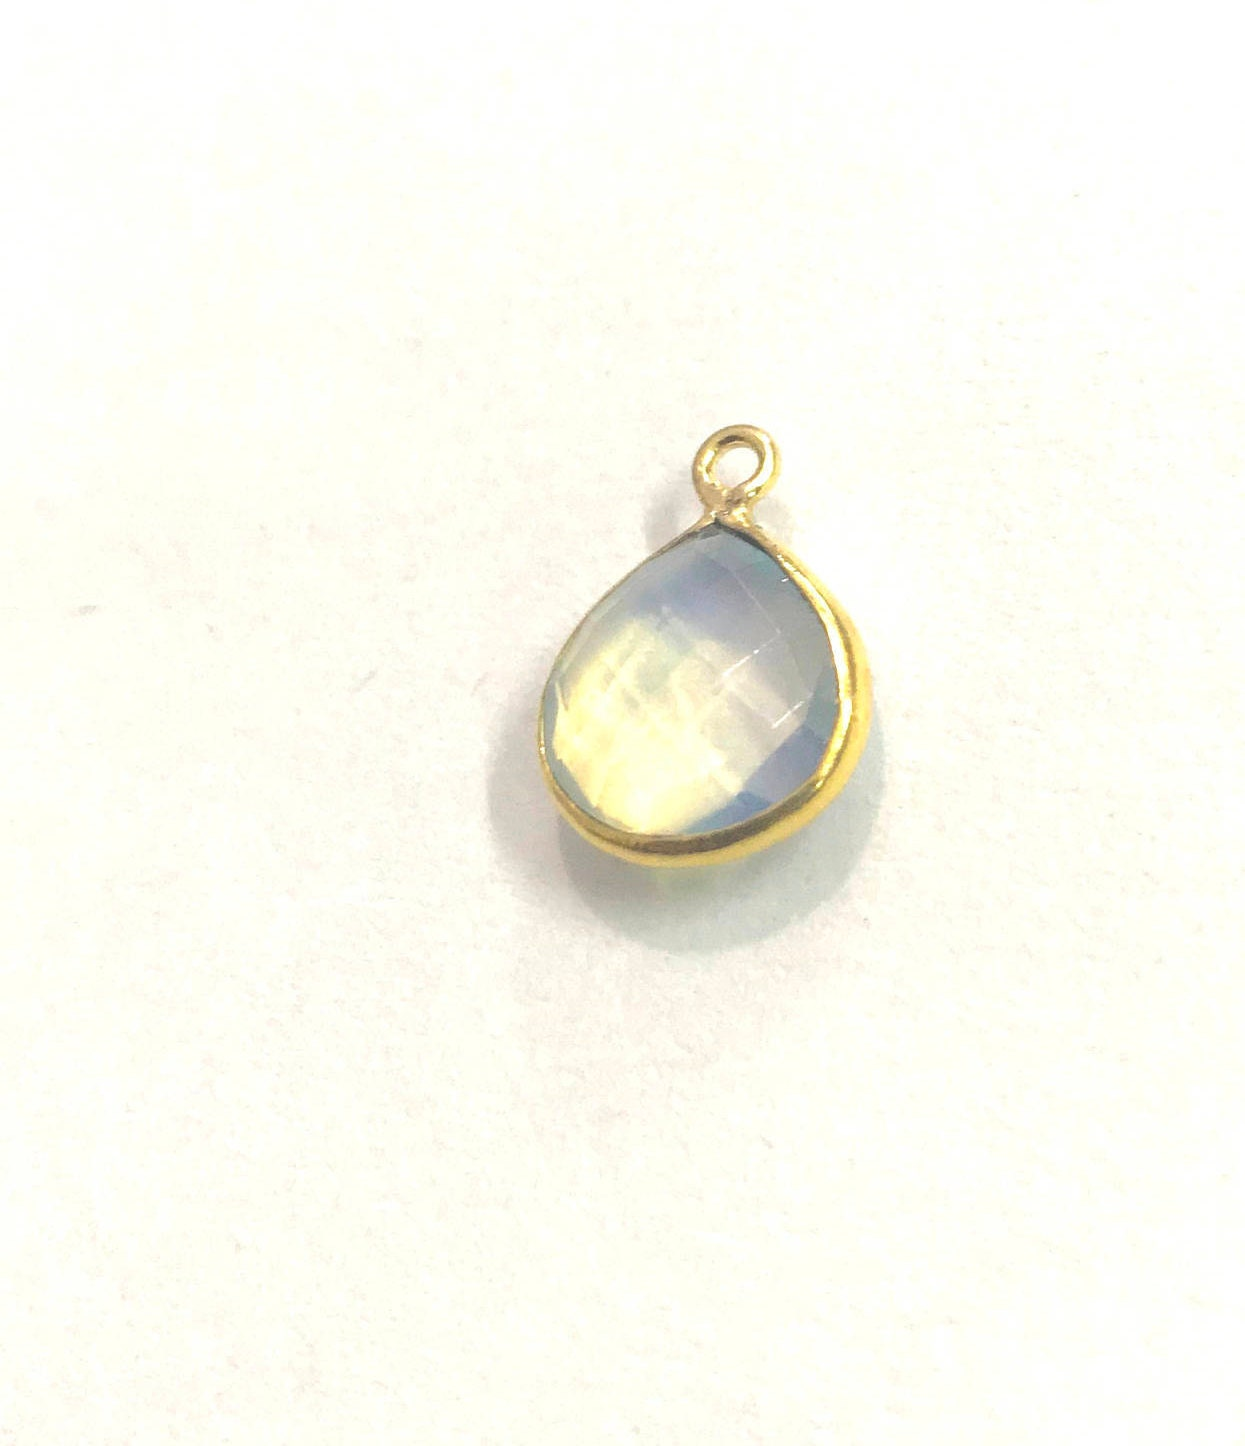 5 Pcs Clear Quartz Pendent Gold Plated Heart Shape Pendent ...